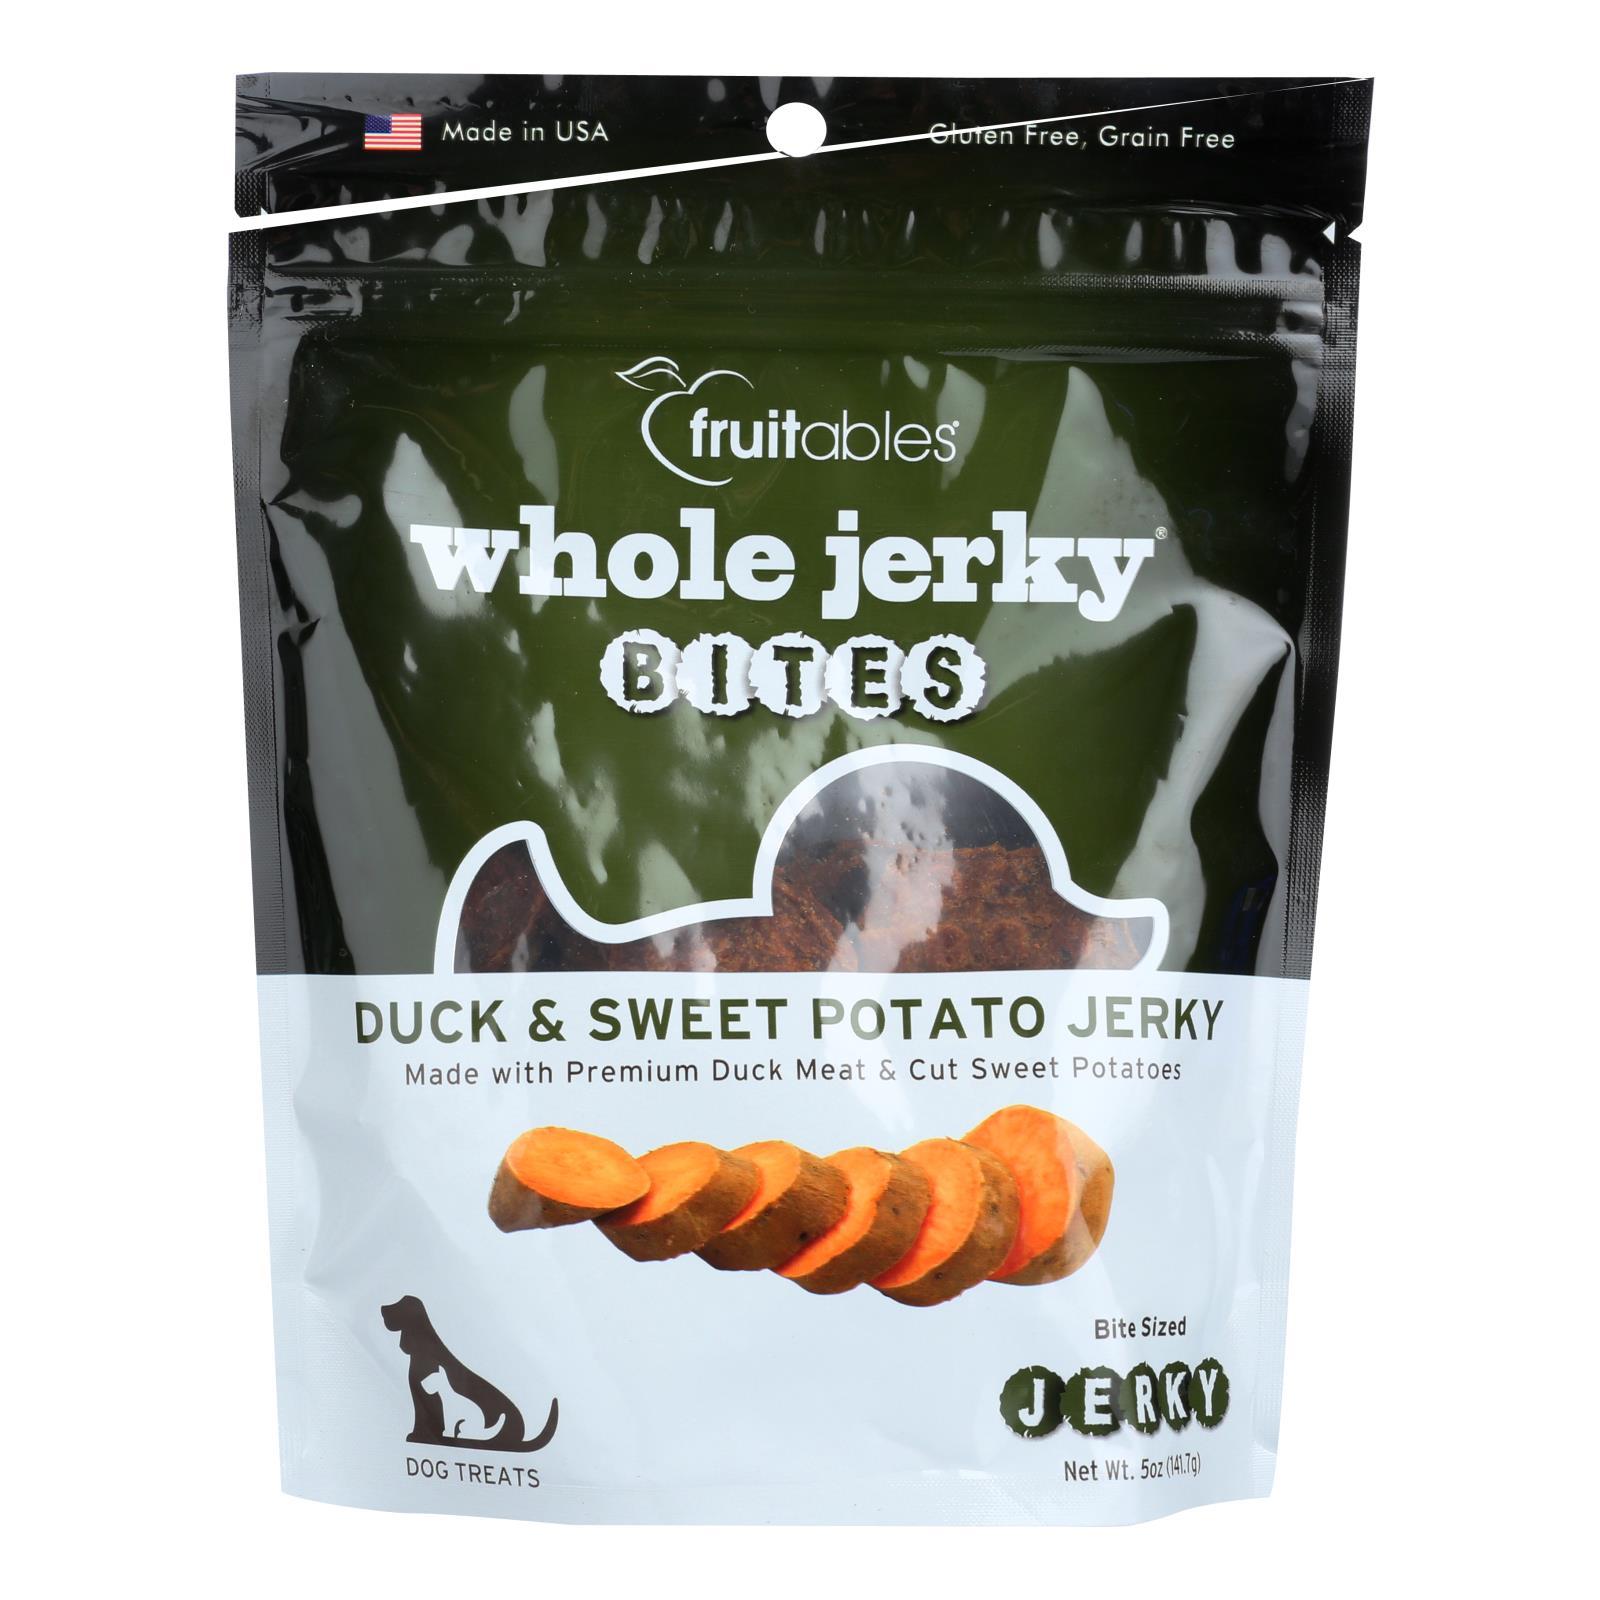 Fruitables Whole Jerky Bites Duck & Sweet Potato Jerky Dog Treats  - Case of 8 - 5 OZ